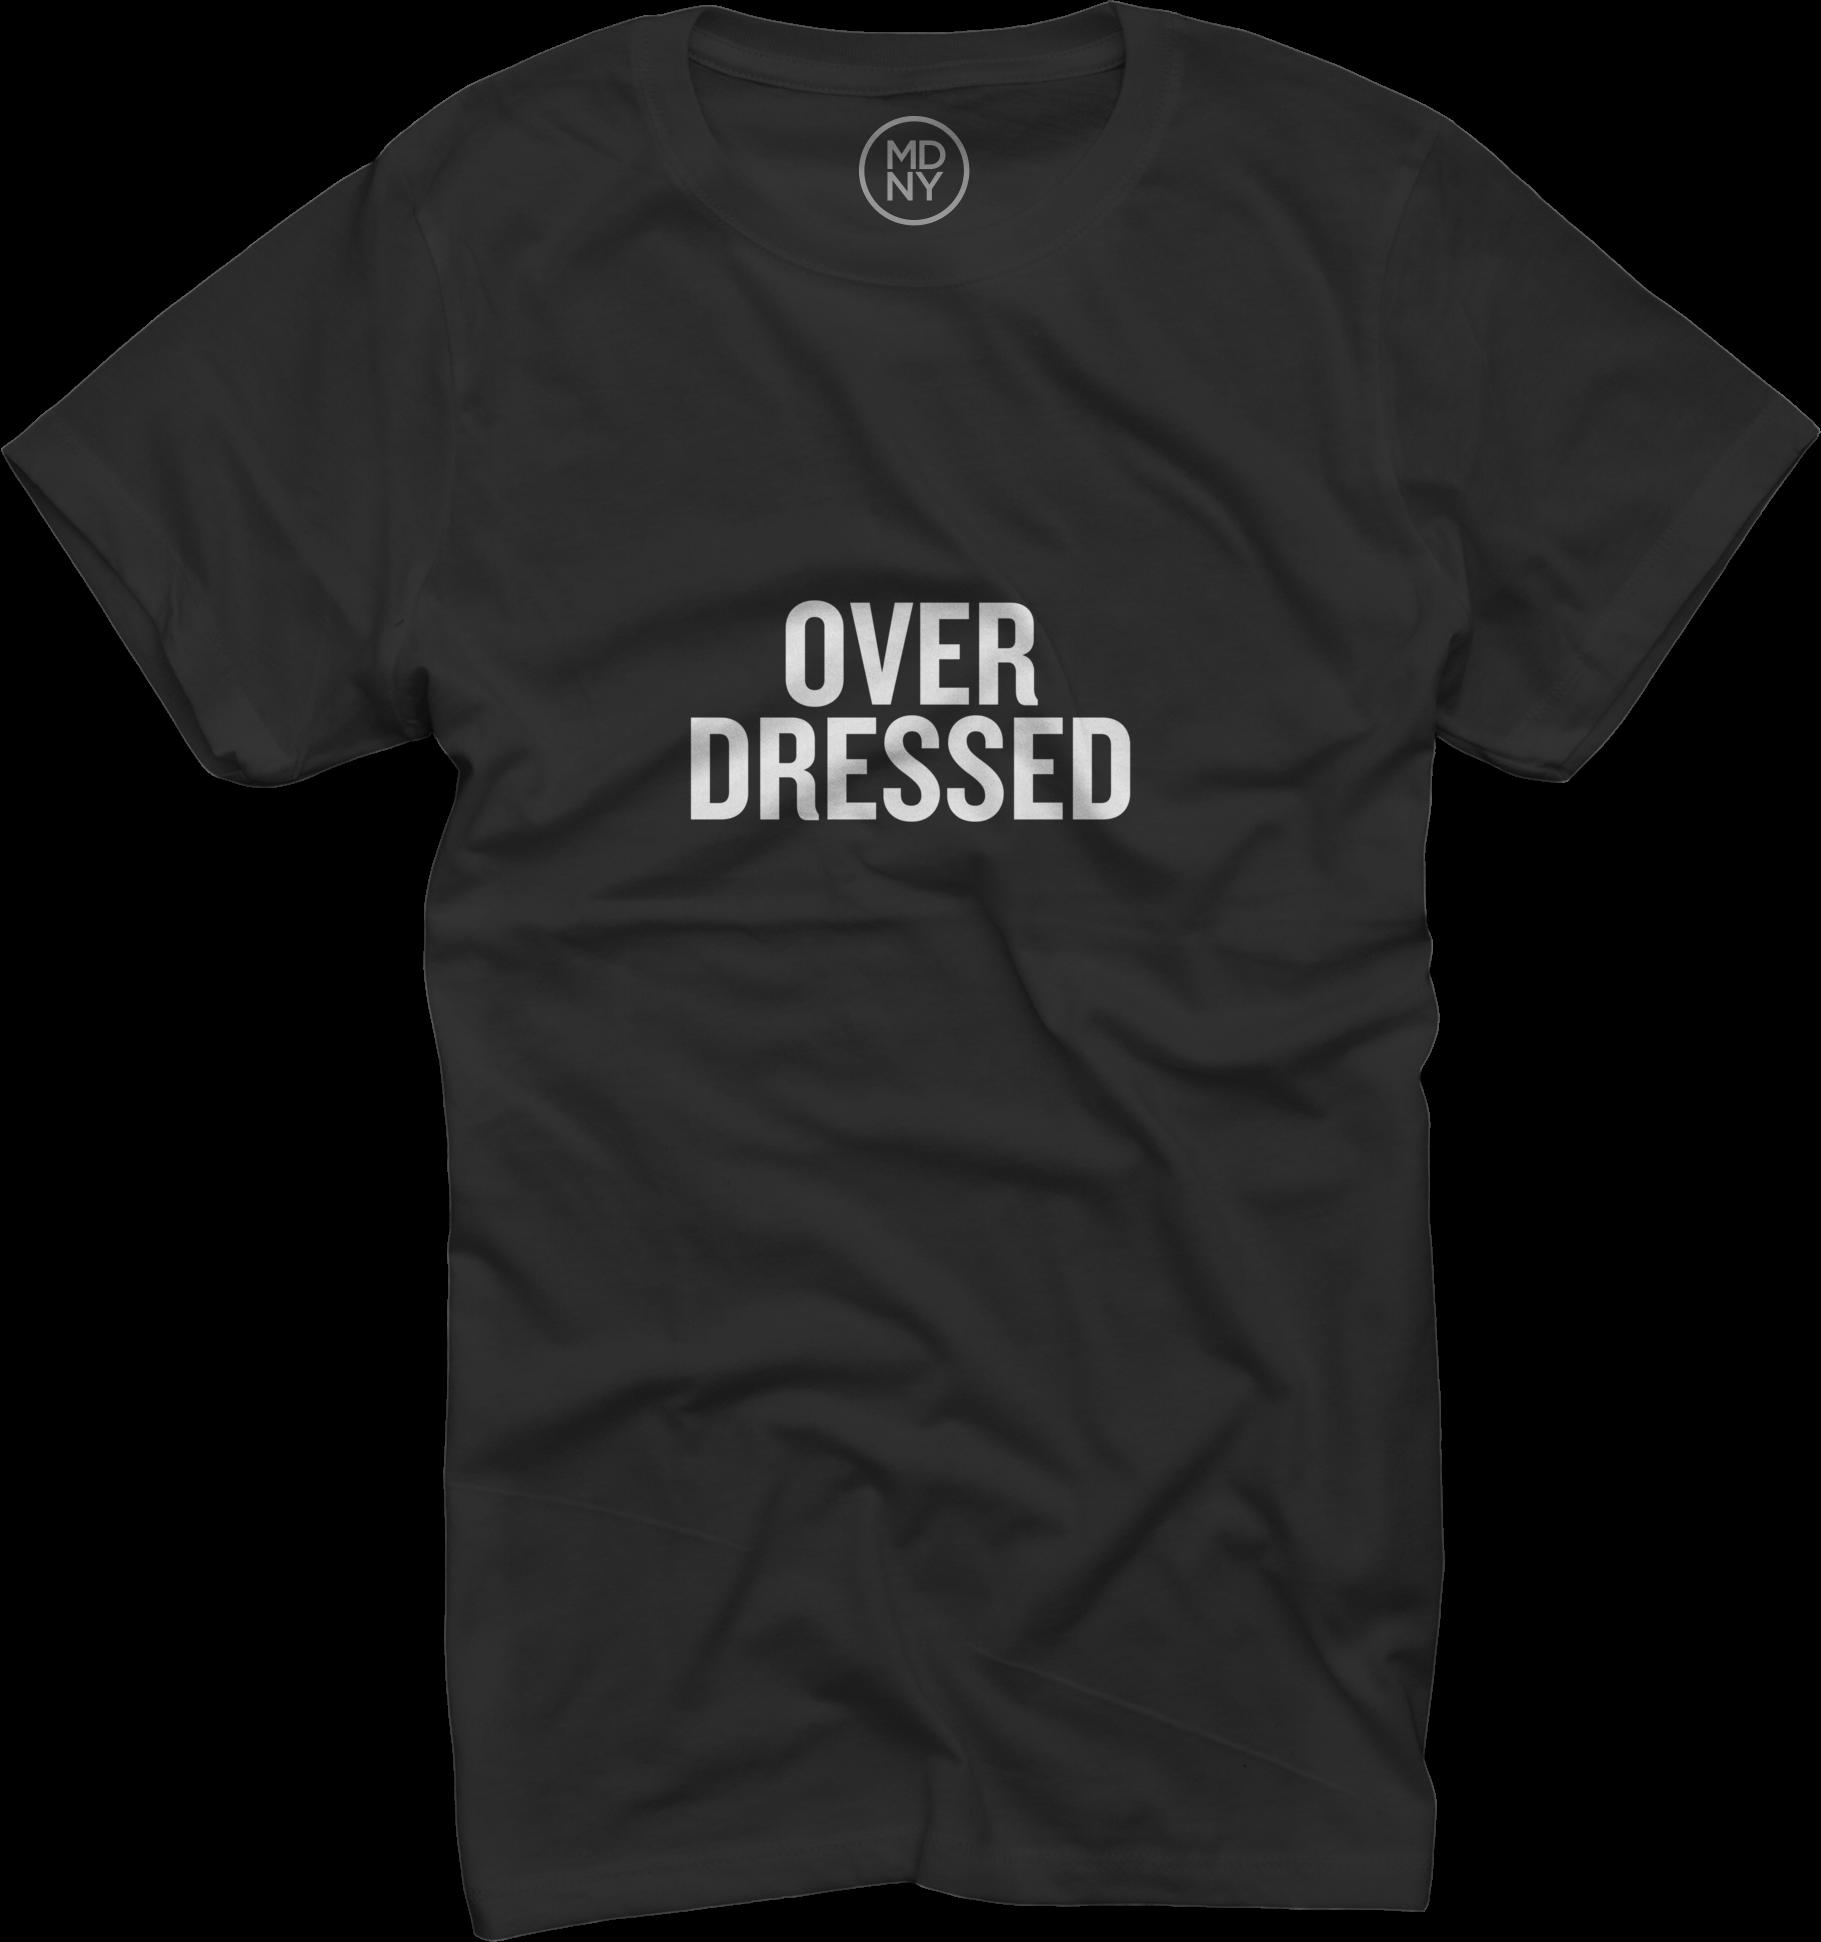 Christian Siriano - Over Dressed (black)